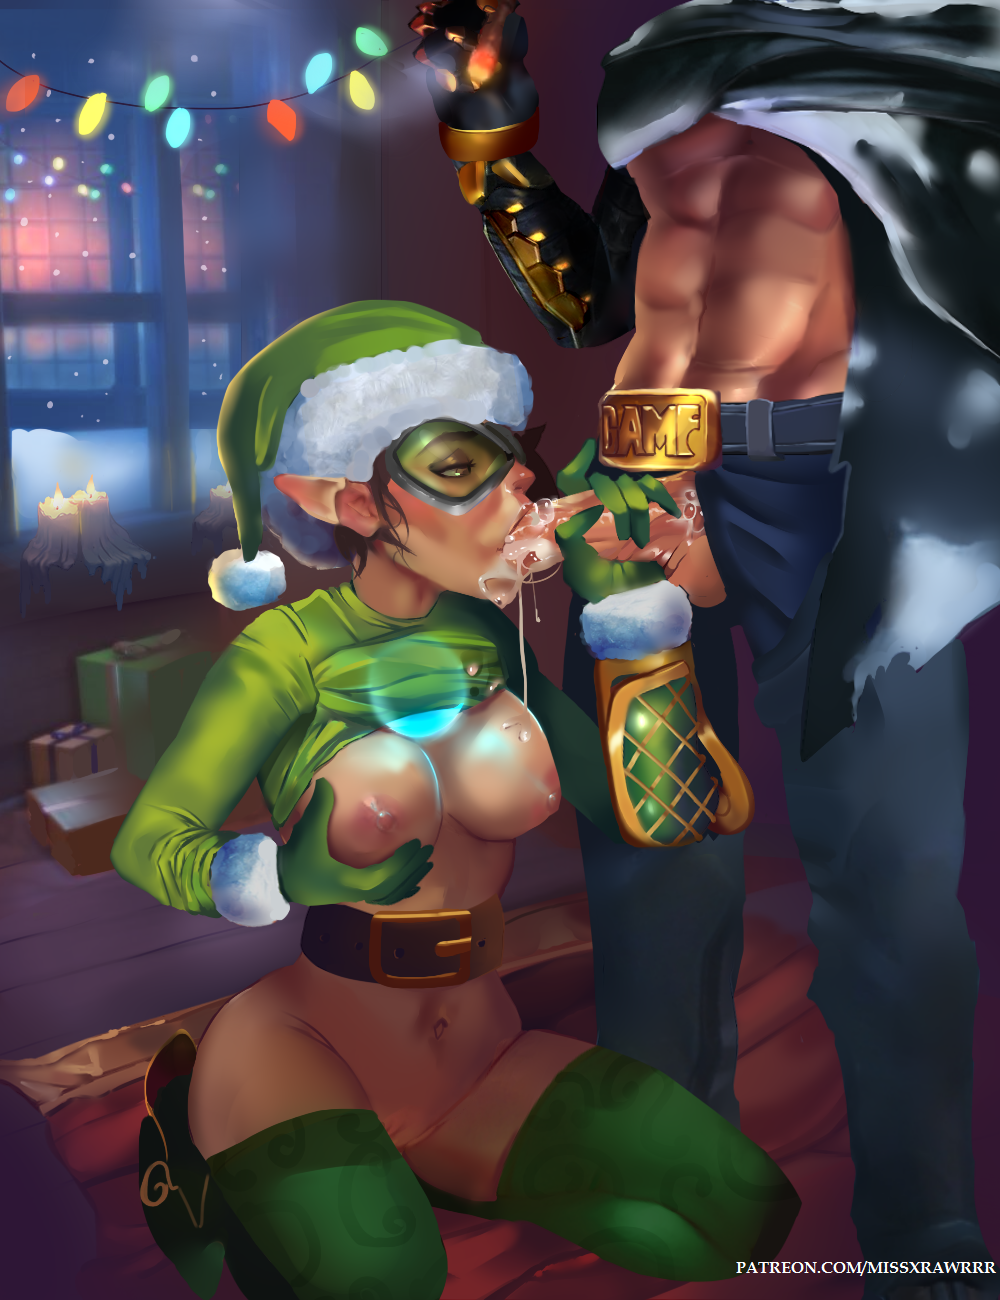 2093253 - Christmas Jesse_McCree Missxrawrrr Overlook Tracer